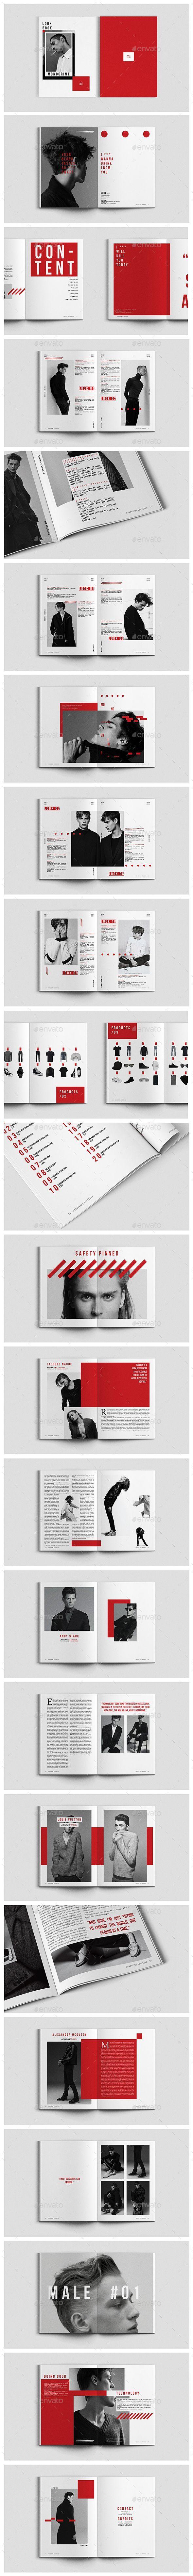 Fashion Magazine / Lookbook - PPT design ideas